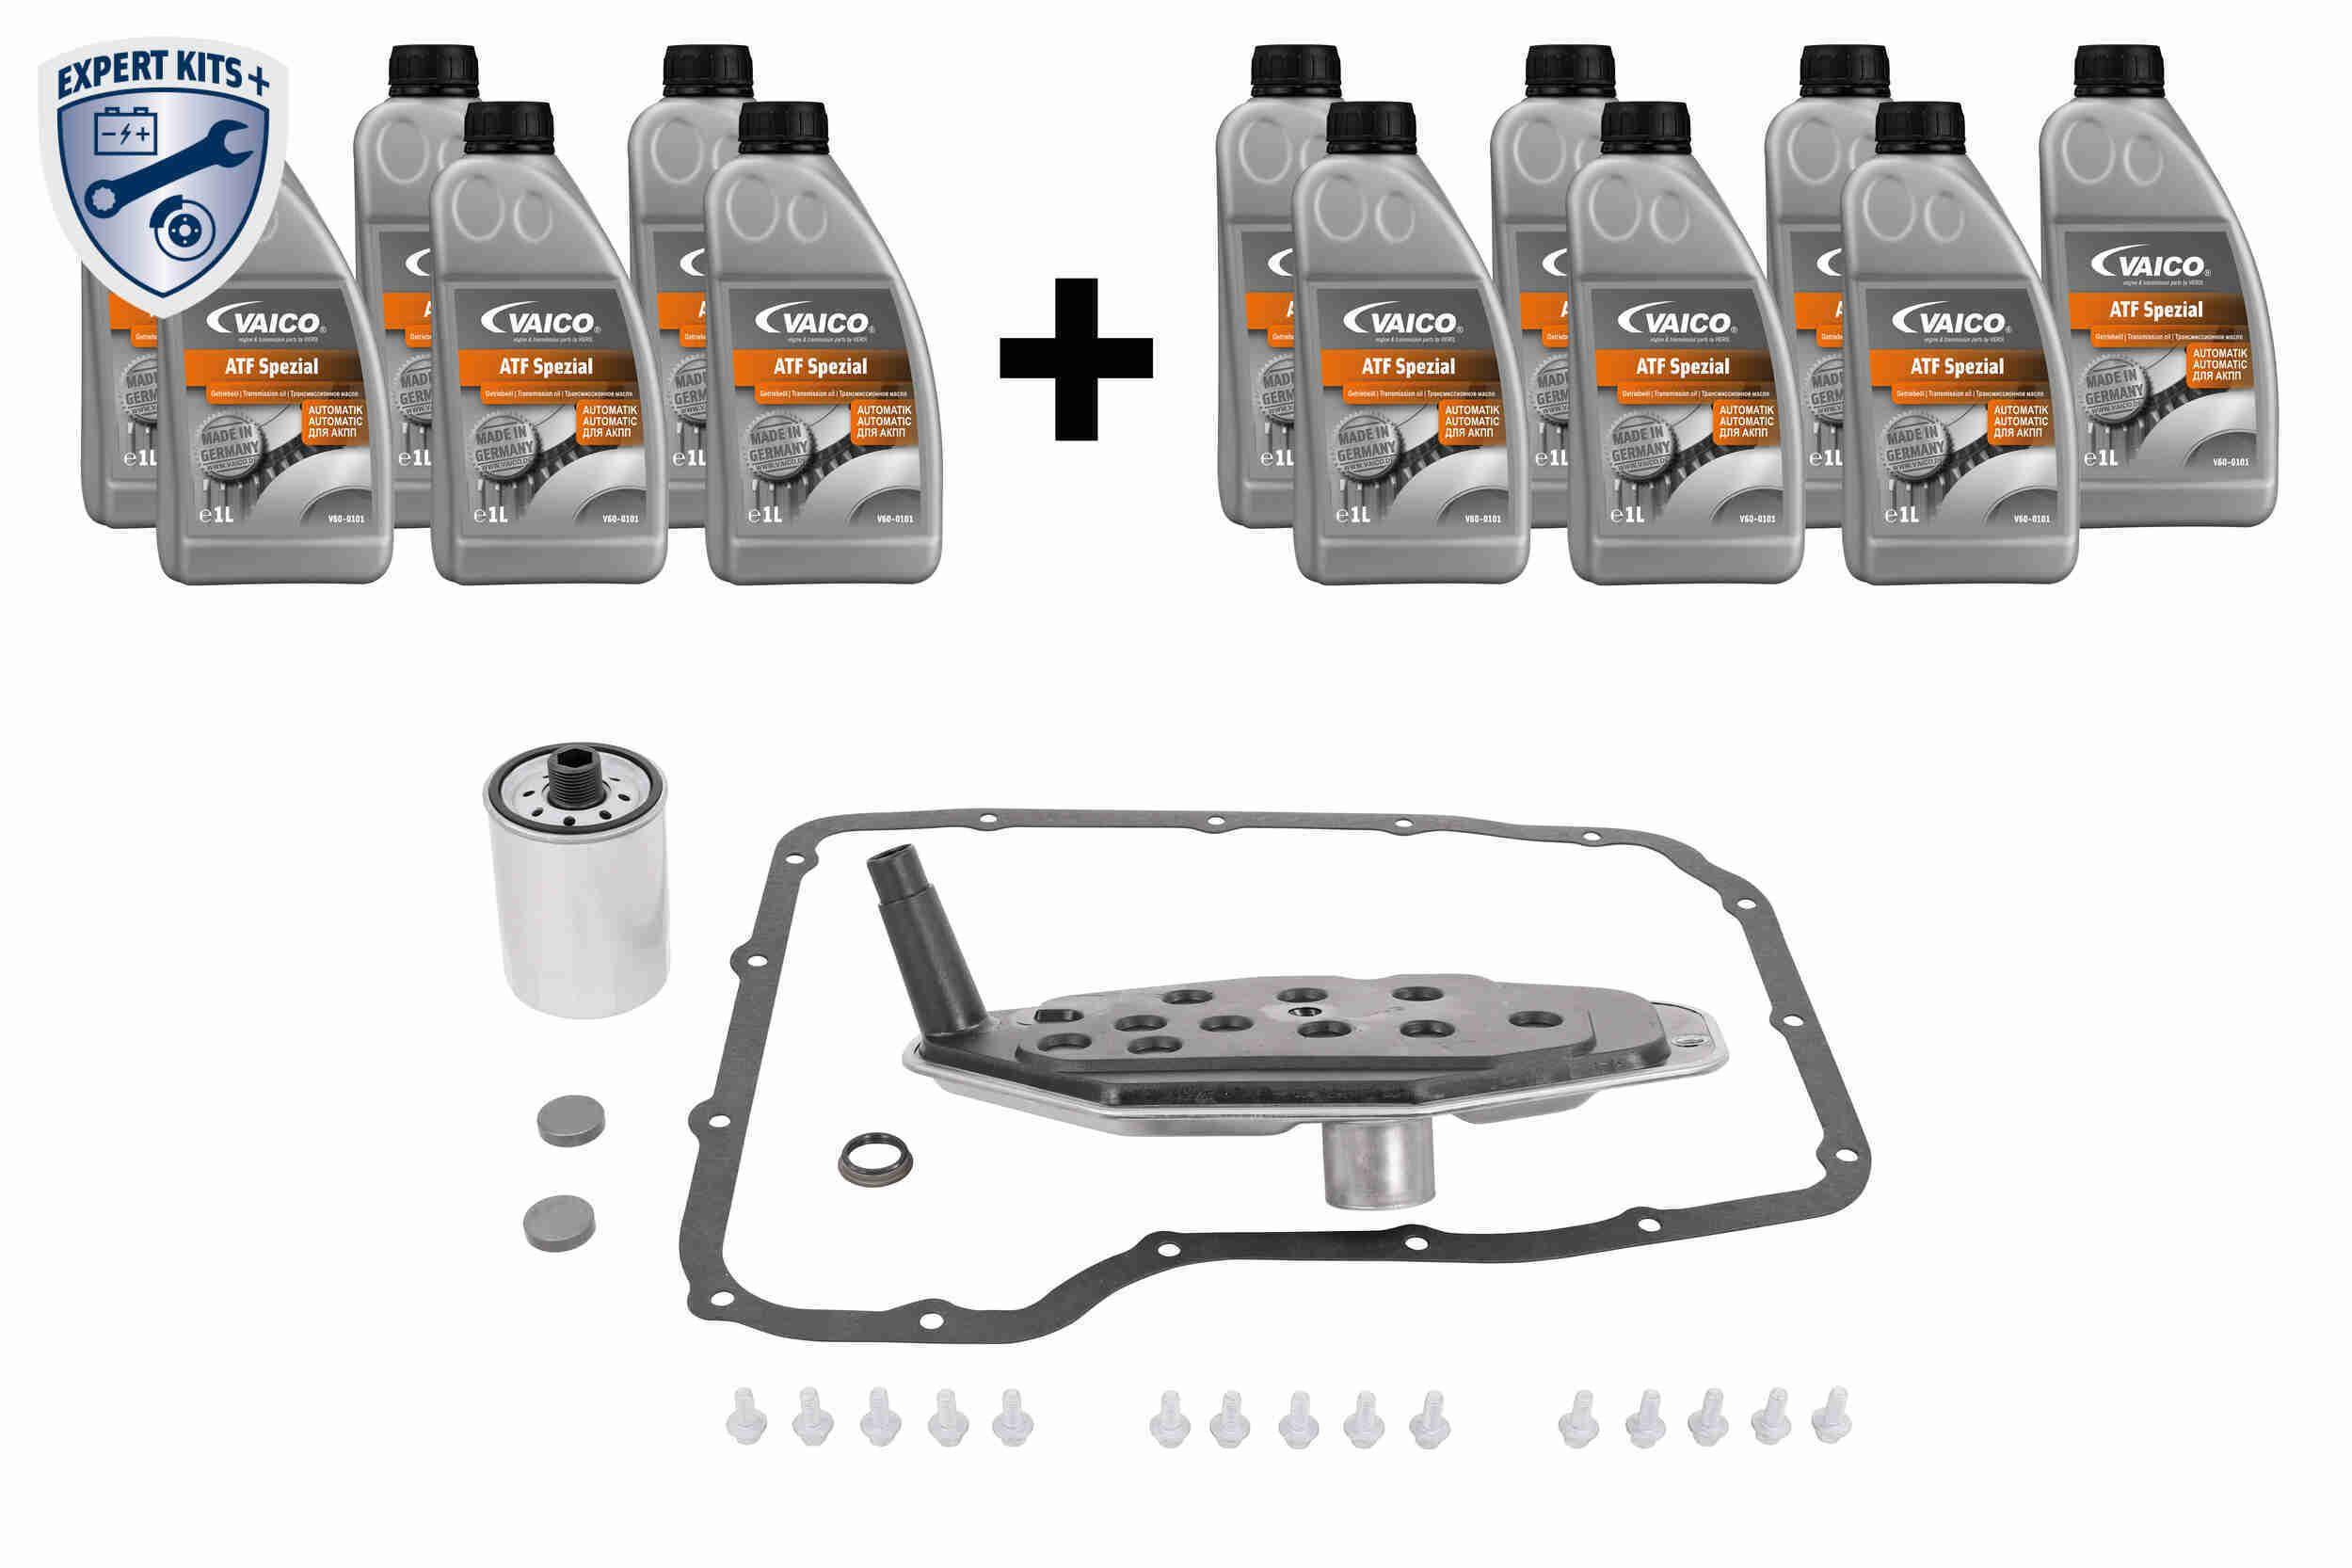 DODGE JOURNEY Teilesatz, Ölwechsel-Automatikgetriebe - Original VAICO V33-0525-XXL